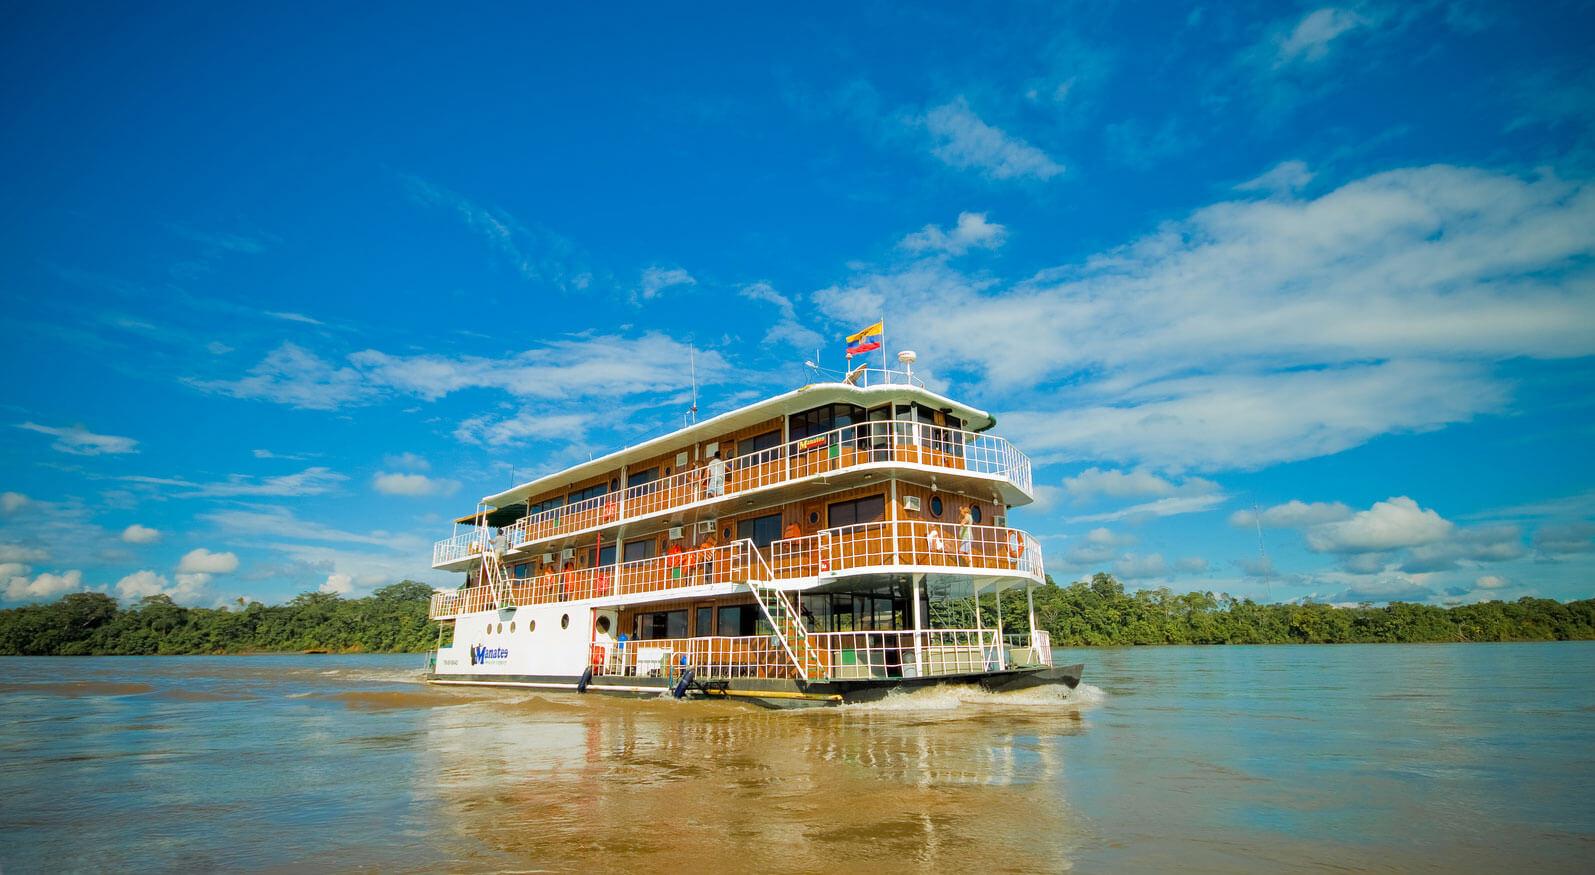 hotel-flottant-amazonie-equateur-gaston-sacaze